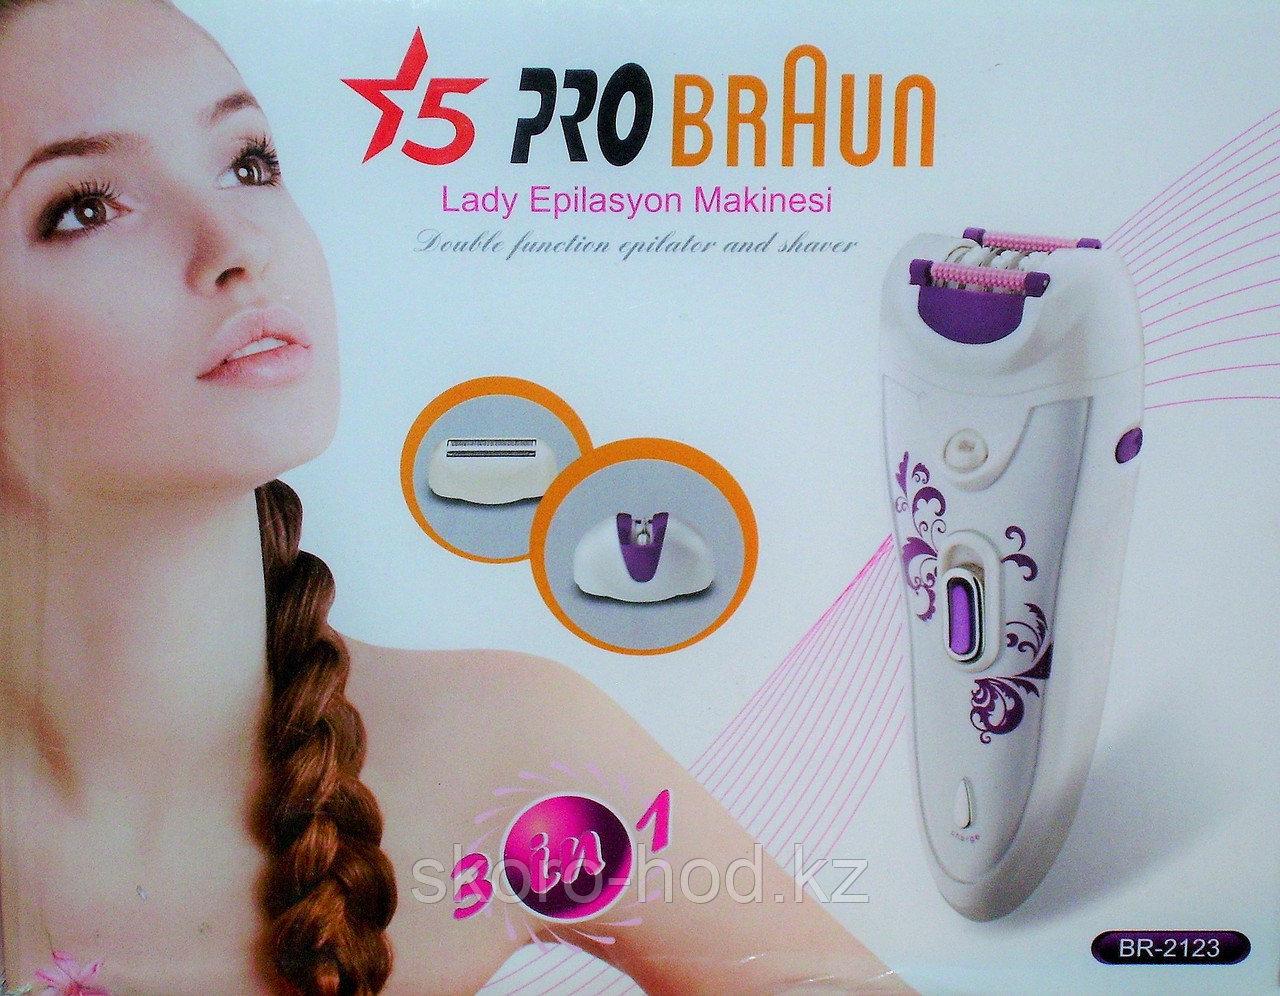 Эпилято Pro Braun 3 в 1, Алматы